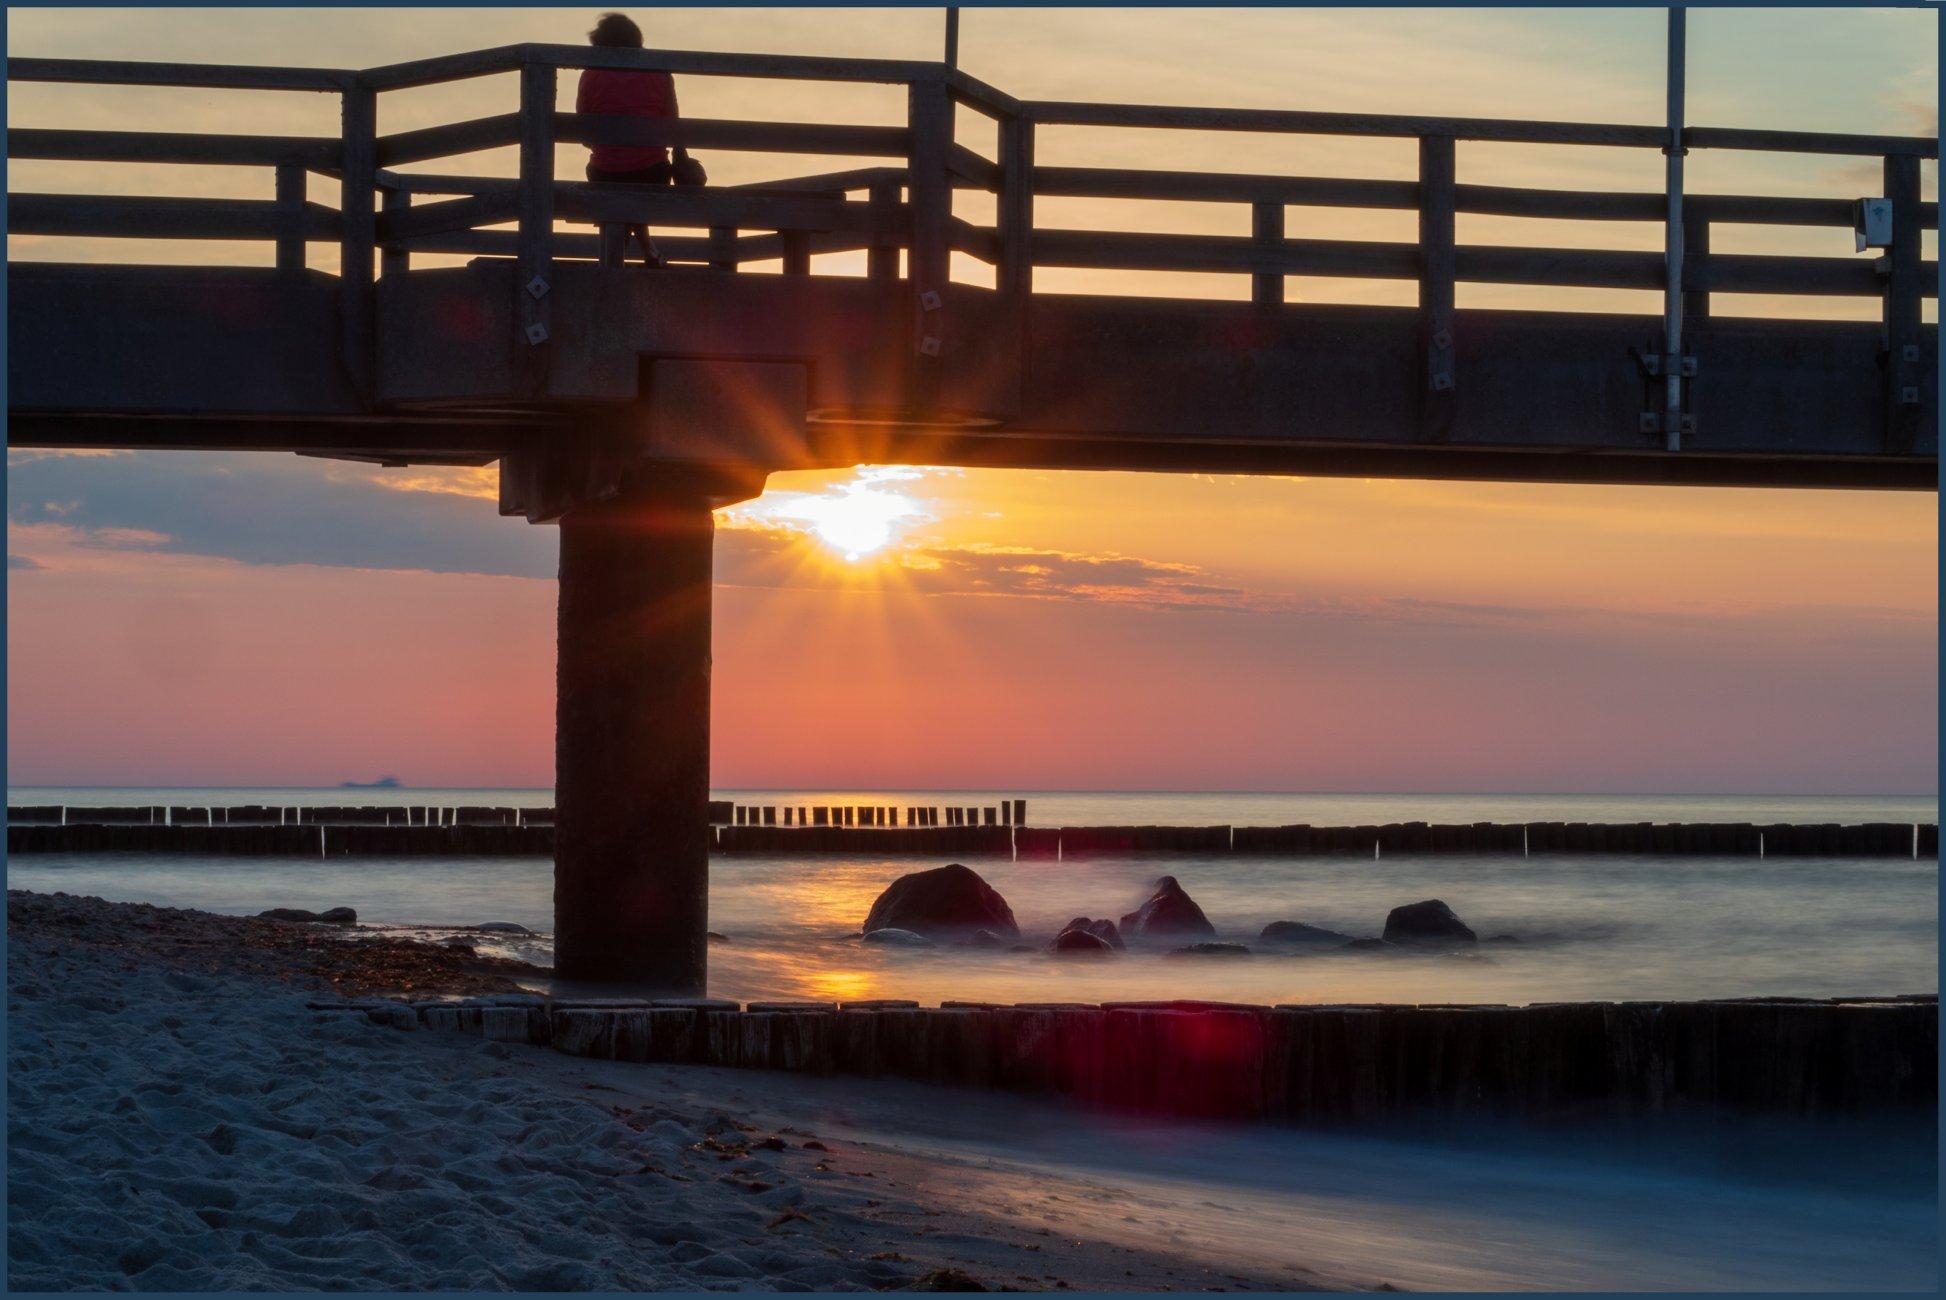 Baltic Sea 2020 - 4